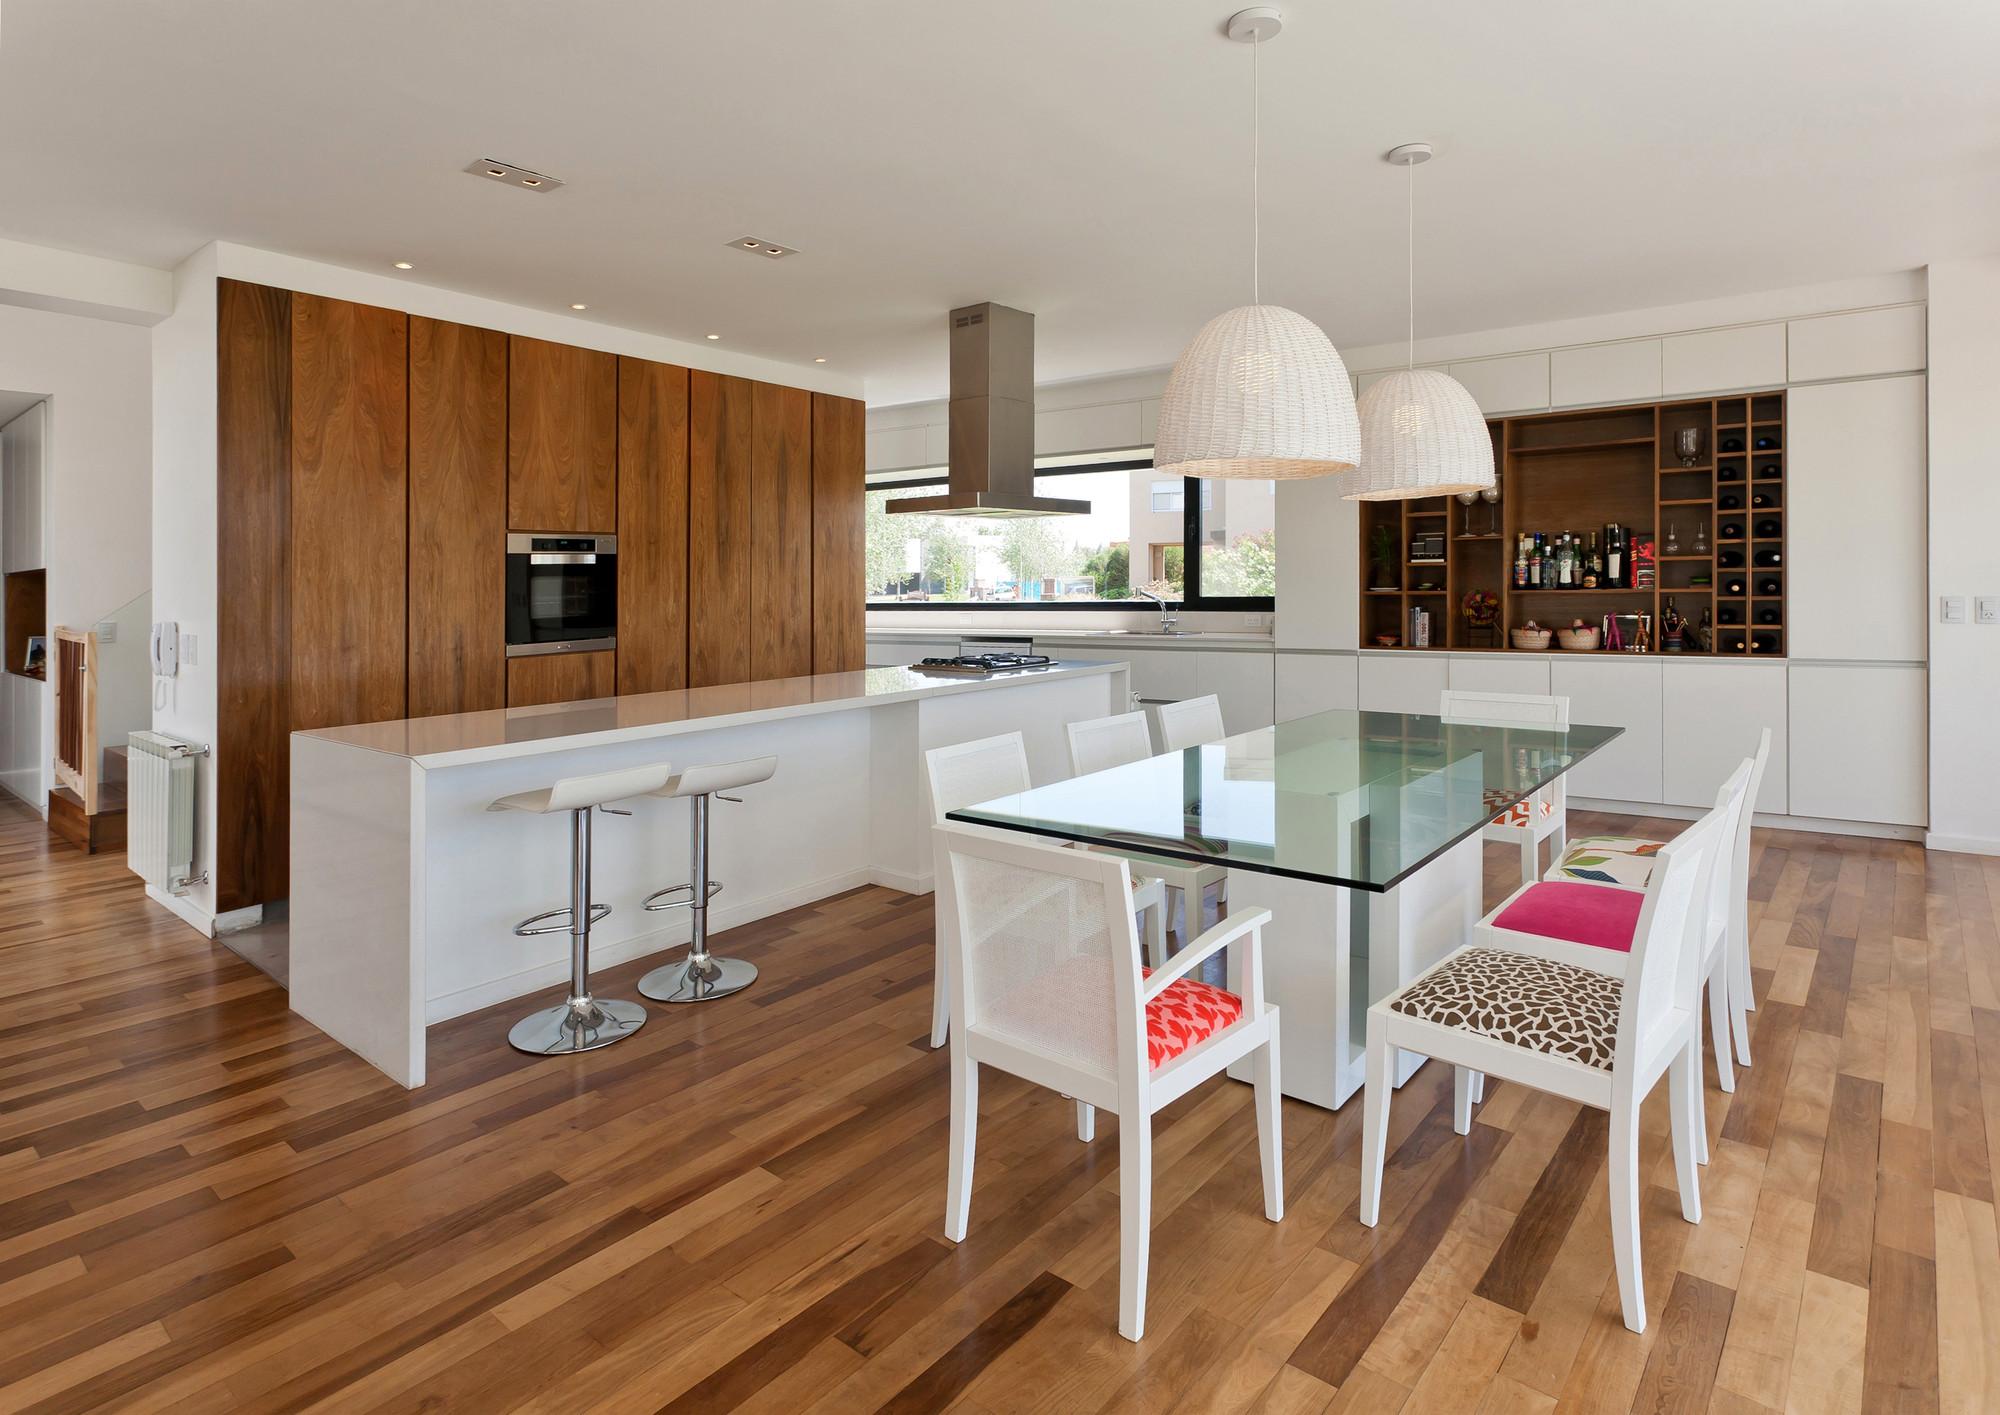 Gallery of mc house vismaracorsi arquitectos 4 for Pisos para comedor